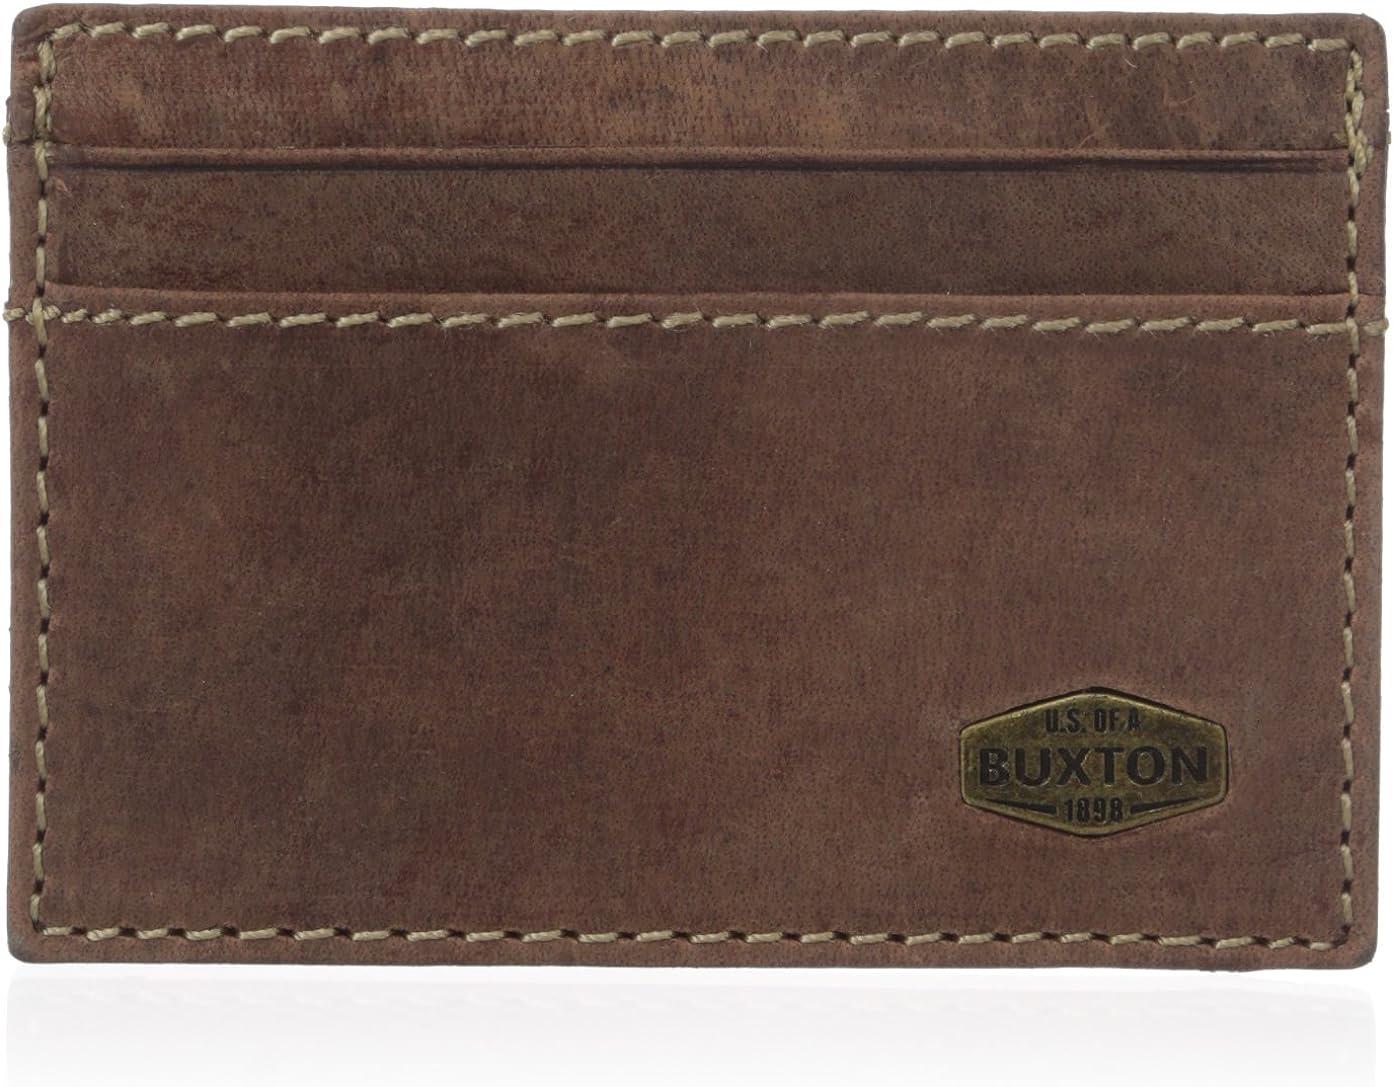 Buxton Men's Expedition RFID Blocking Leather Slim Minimalist Front Pocket Get-Away Wallet